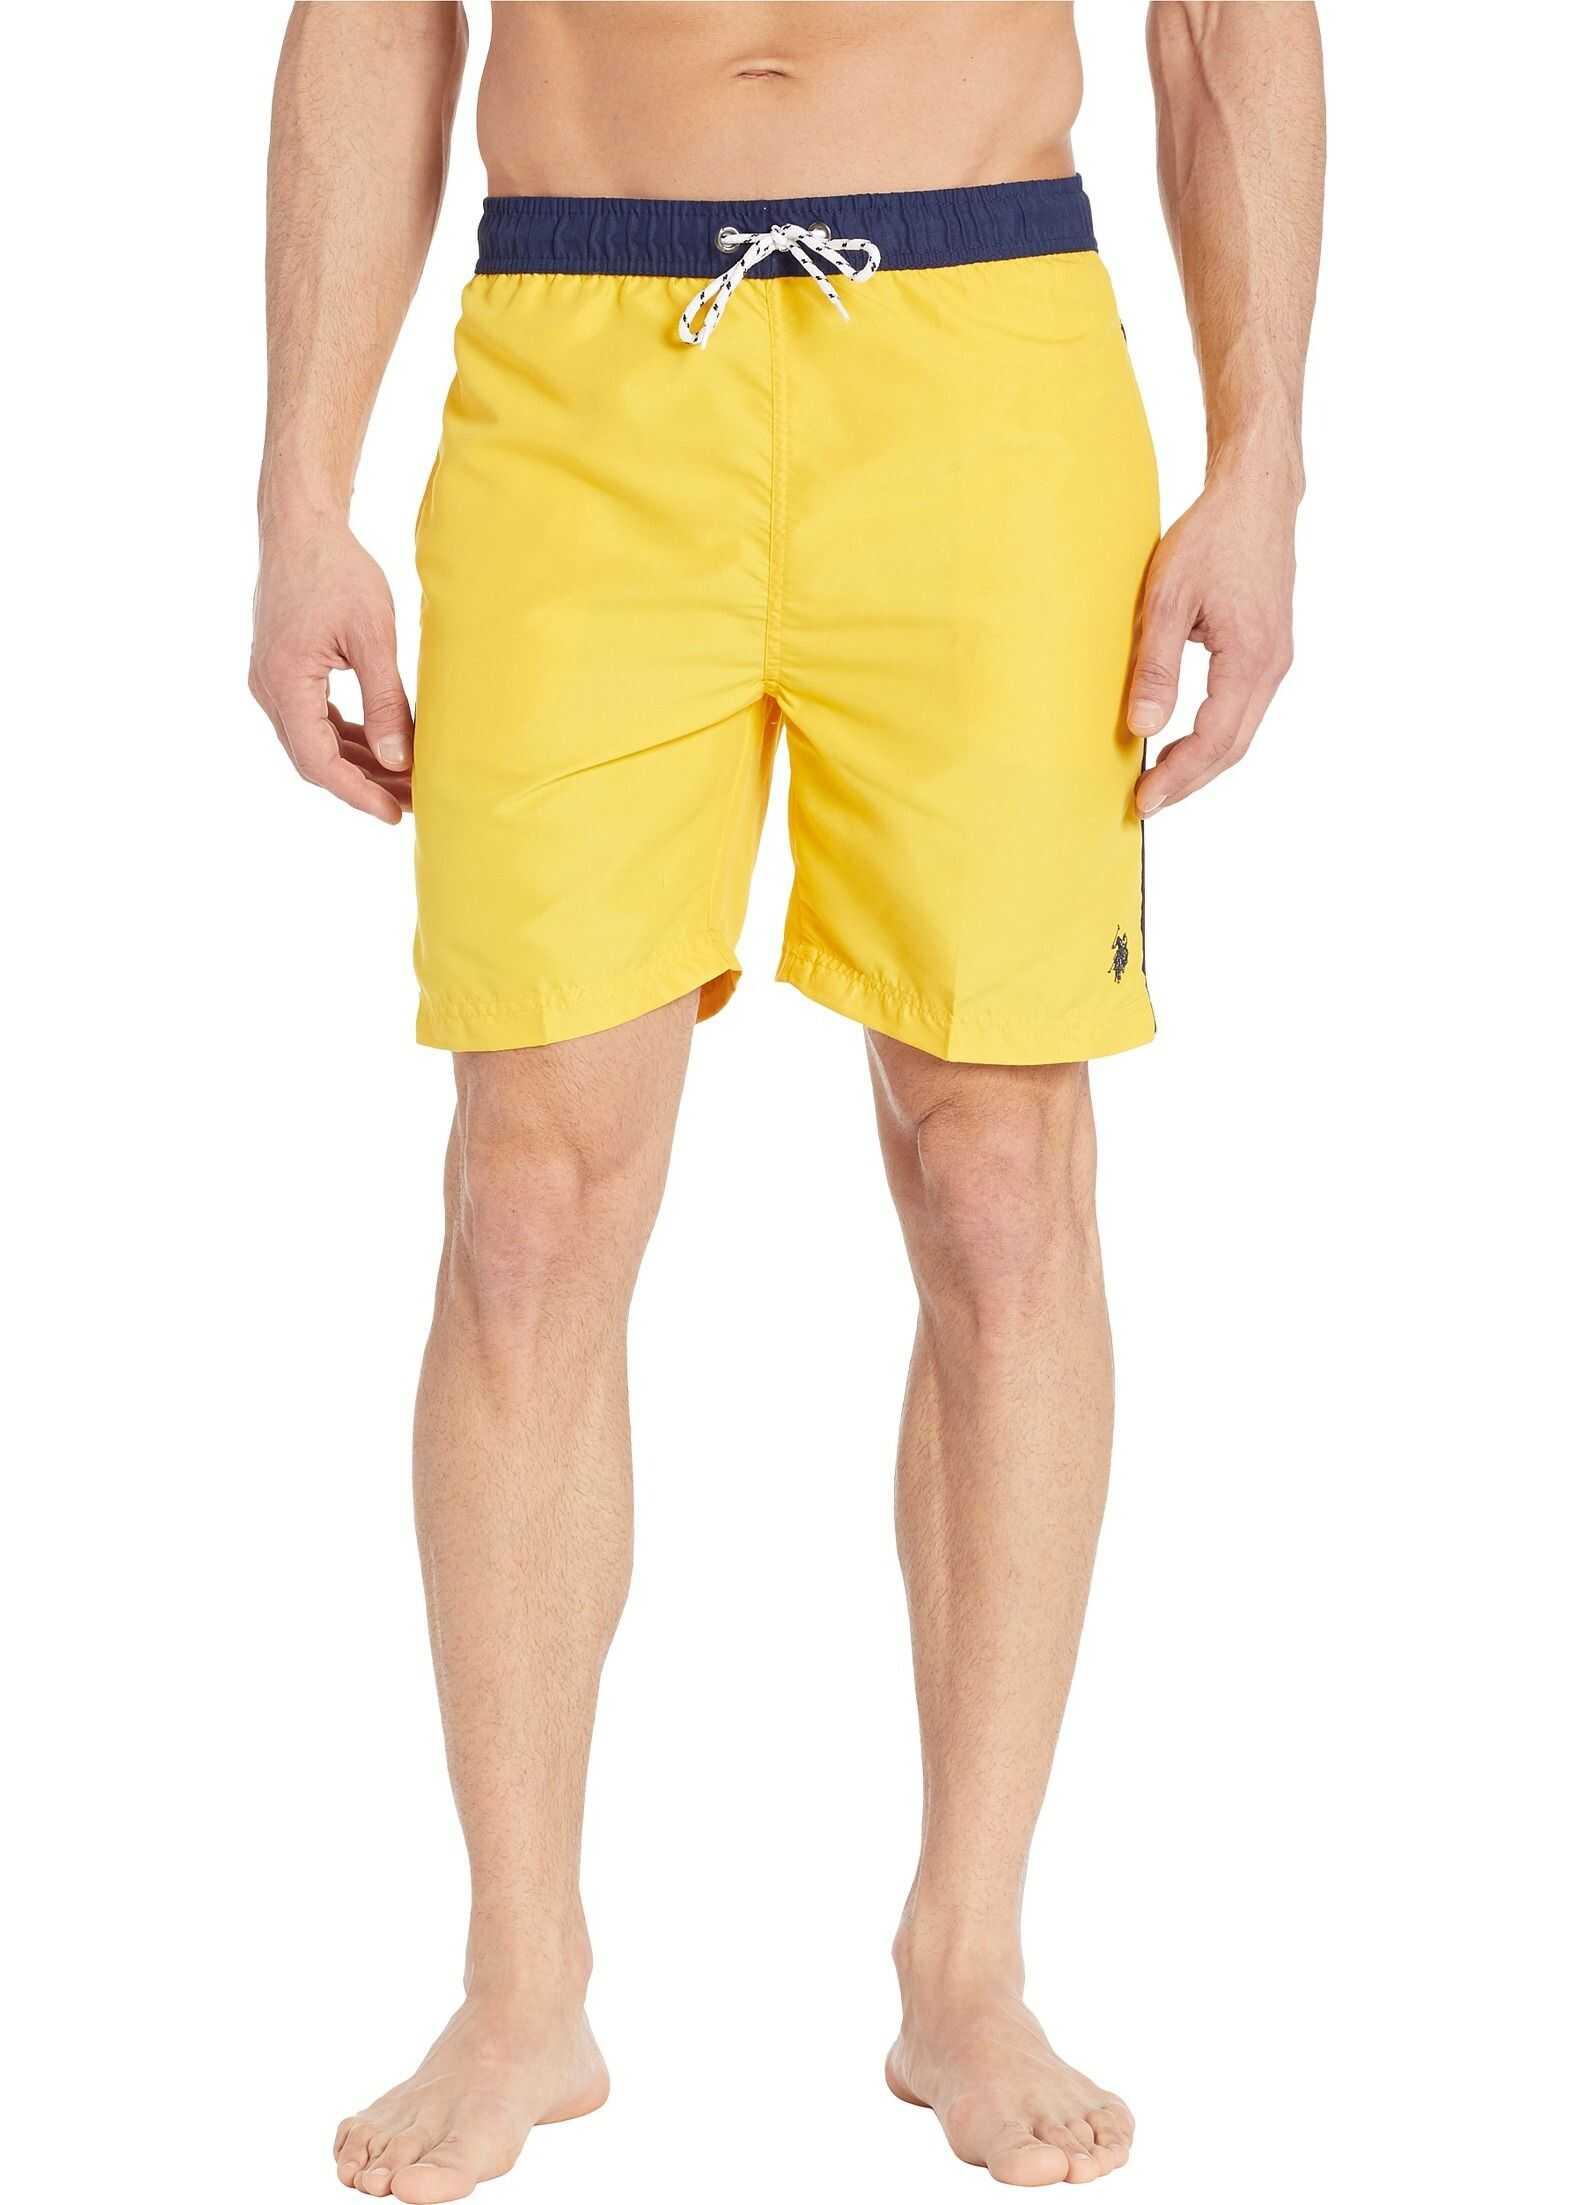 U.S. POLO ASSN. Contrast Waistband Swim Shorts Cape Yellow